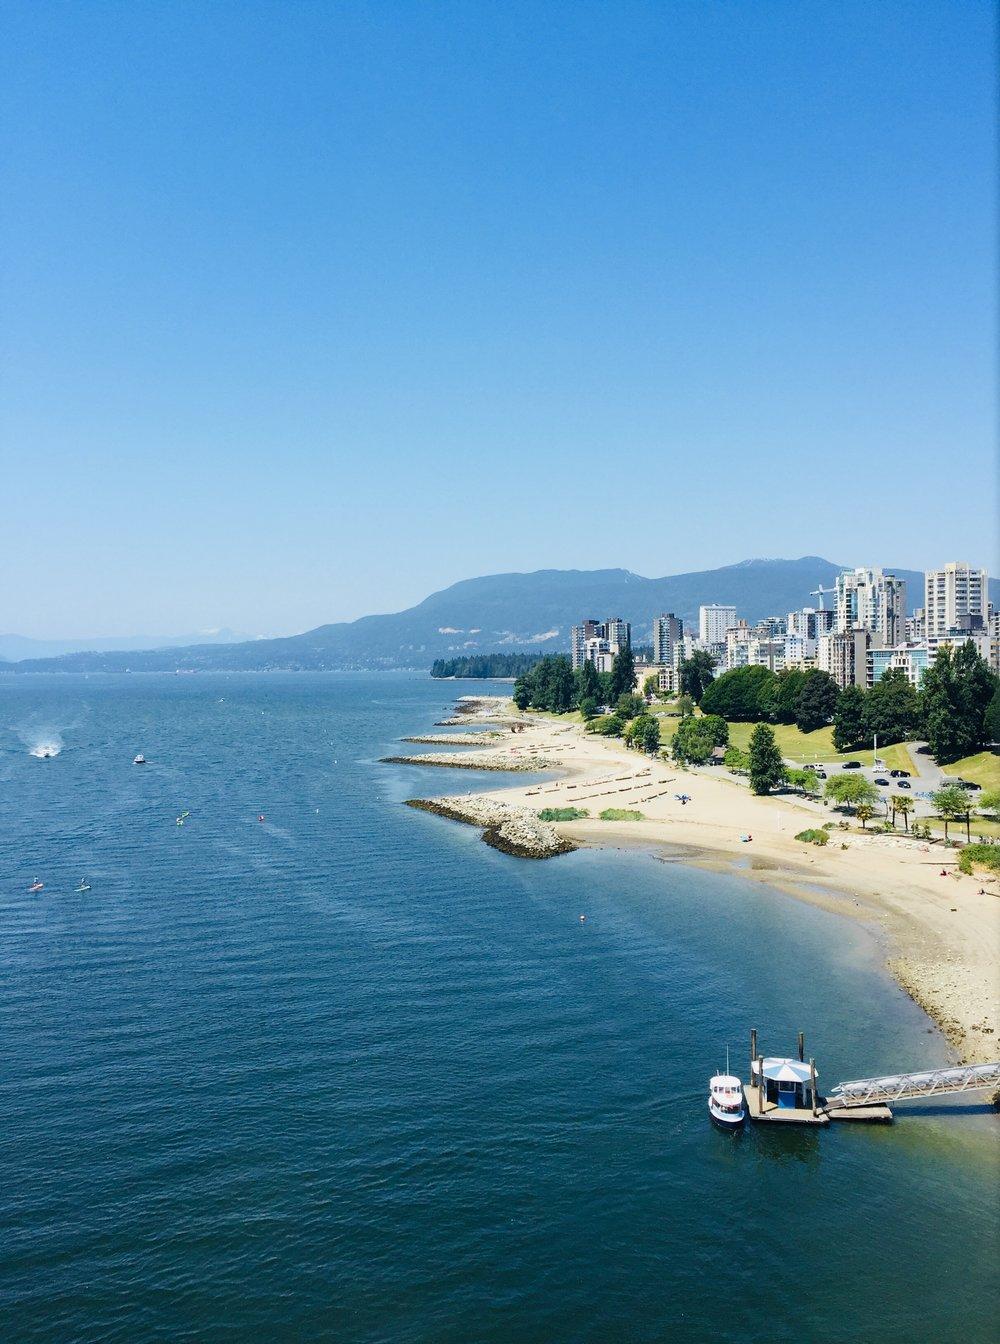 Vancouver skyline from Granville Bridge.